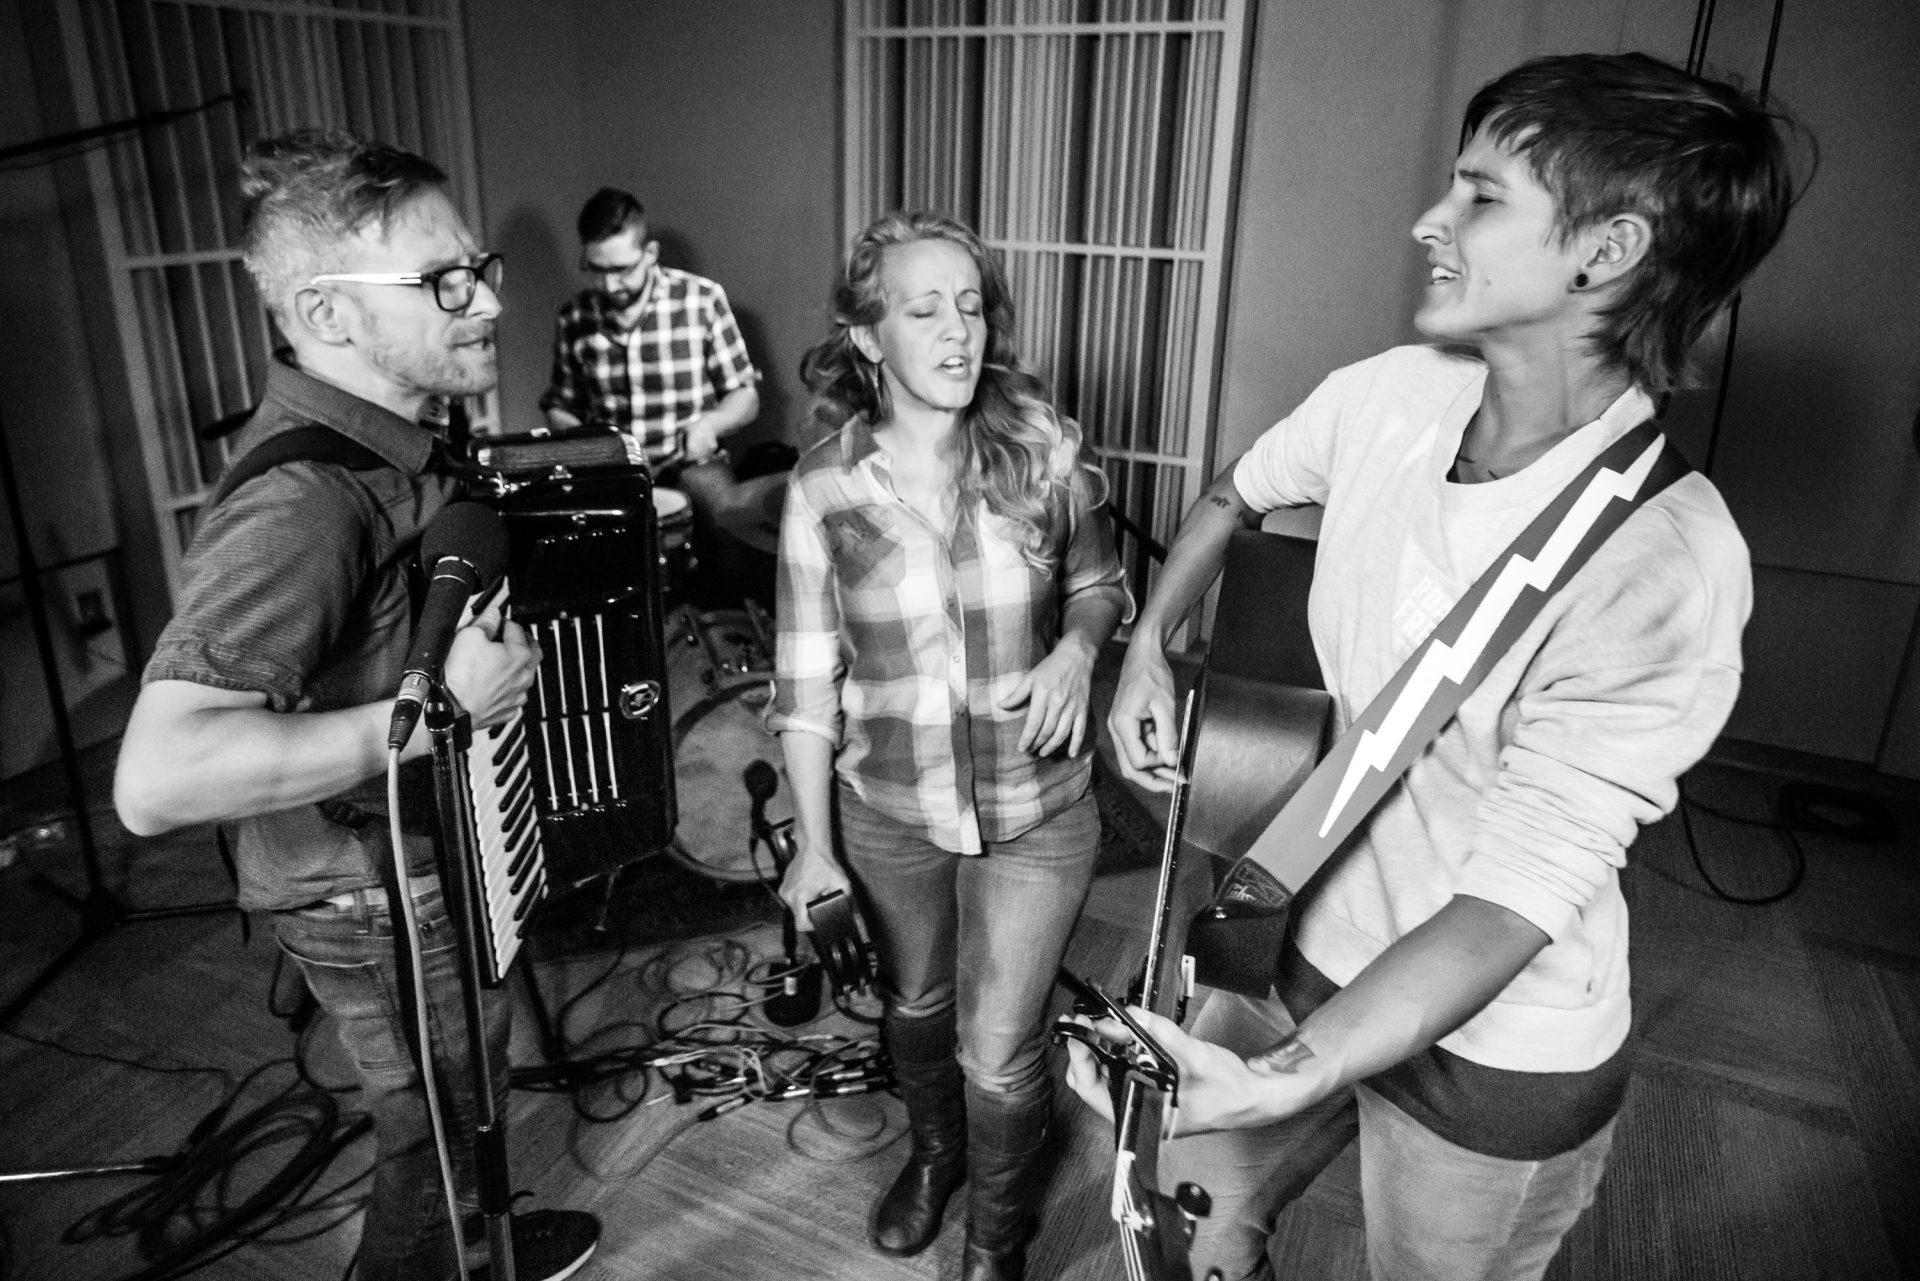 Jason, Kelly, Jenn and Sarah performing